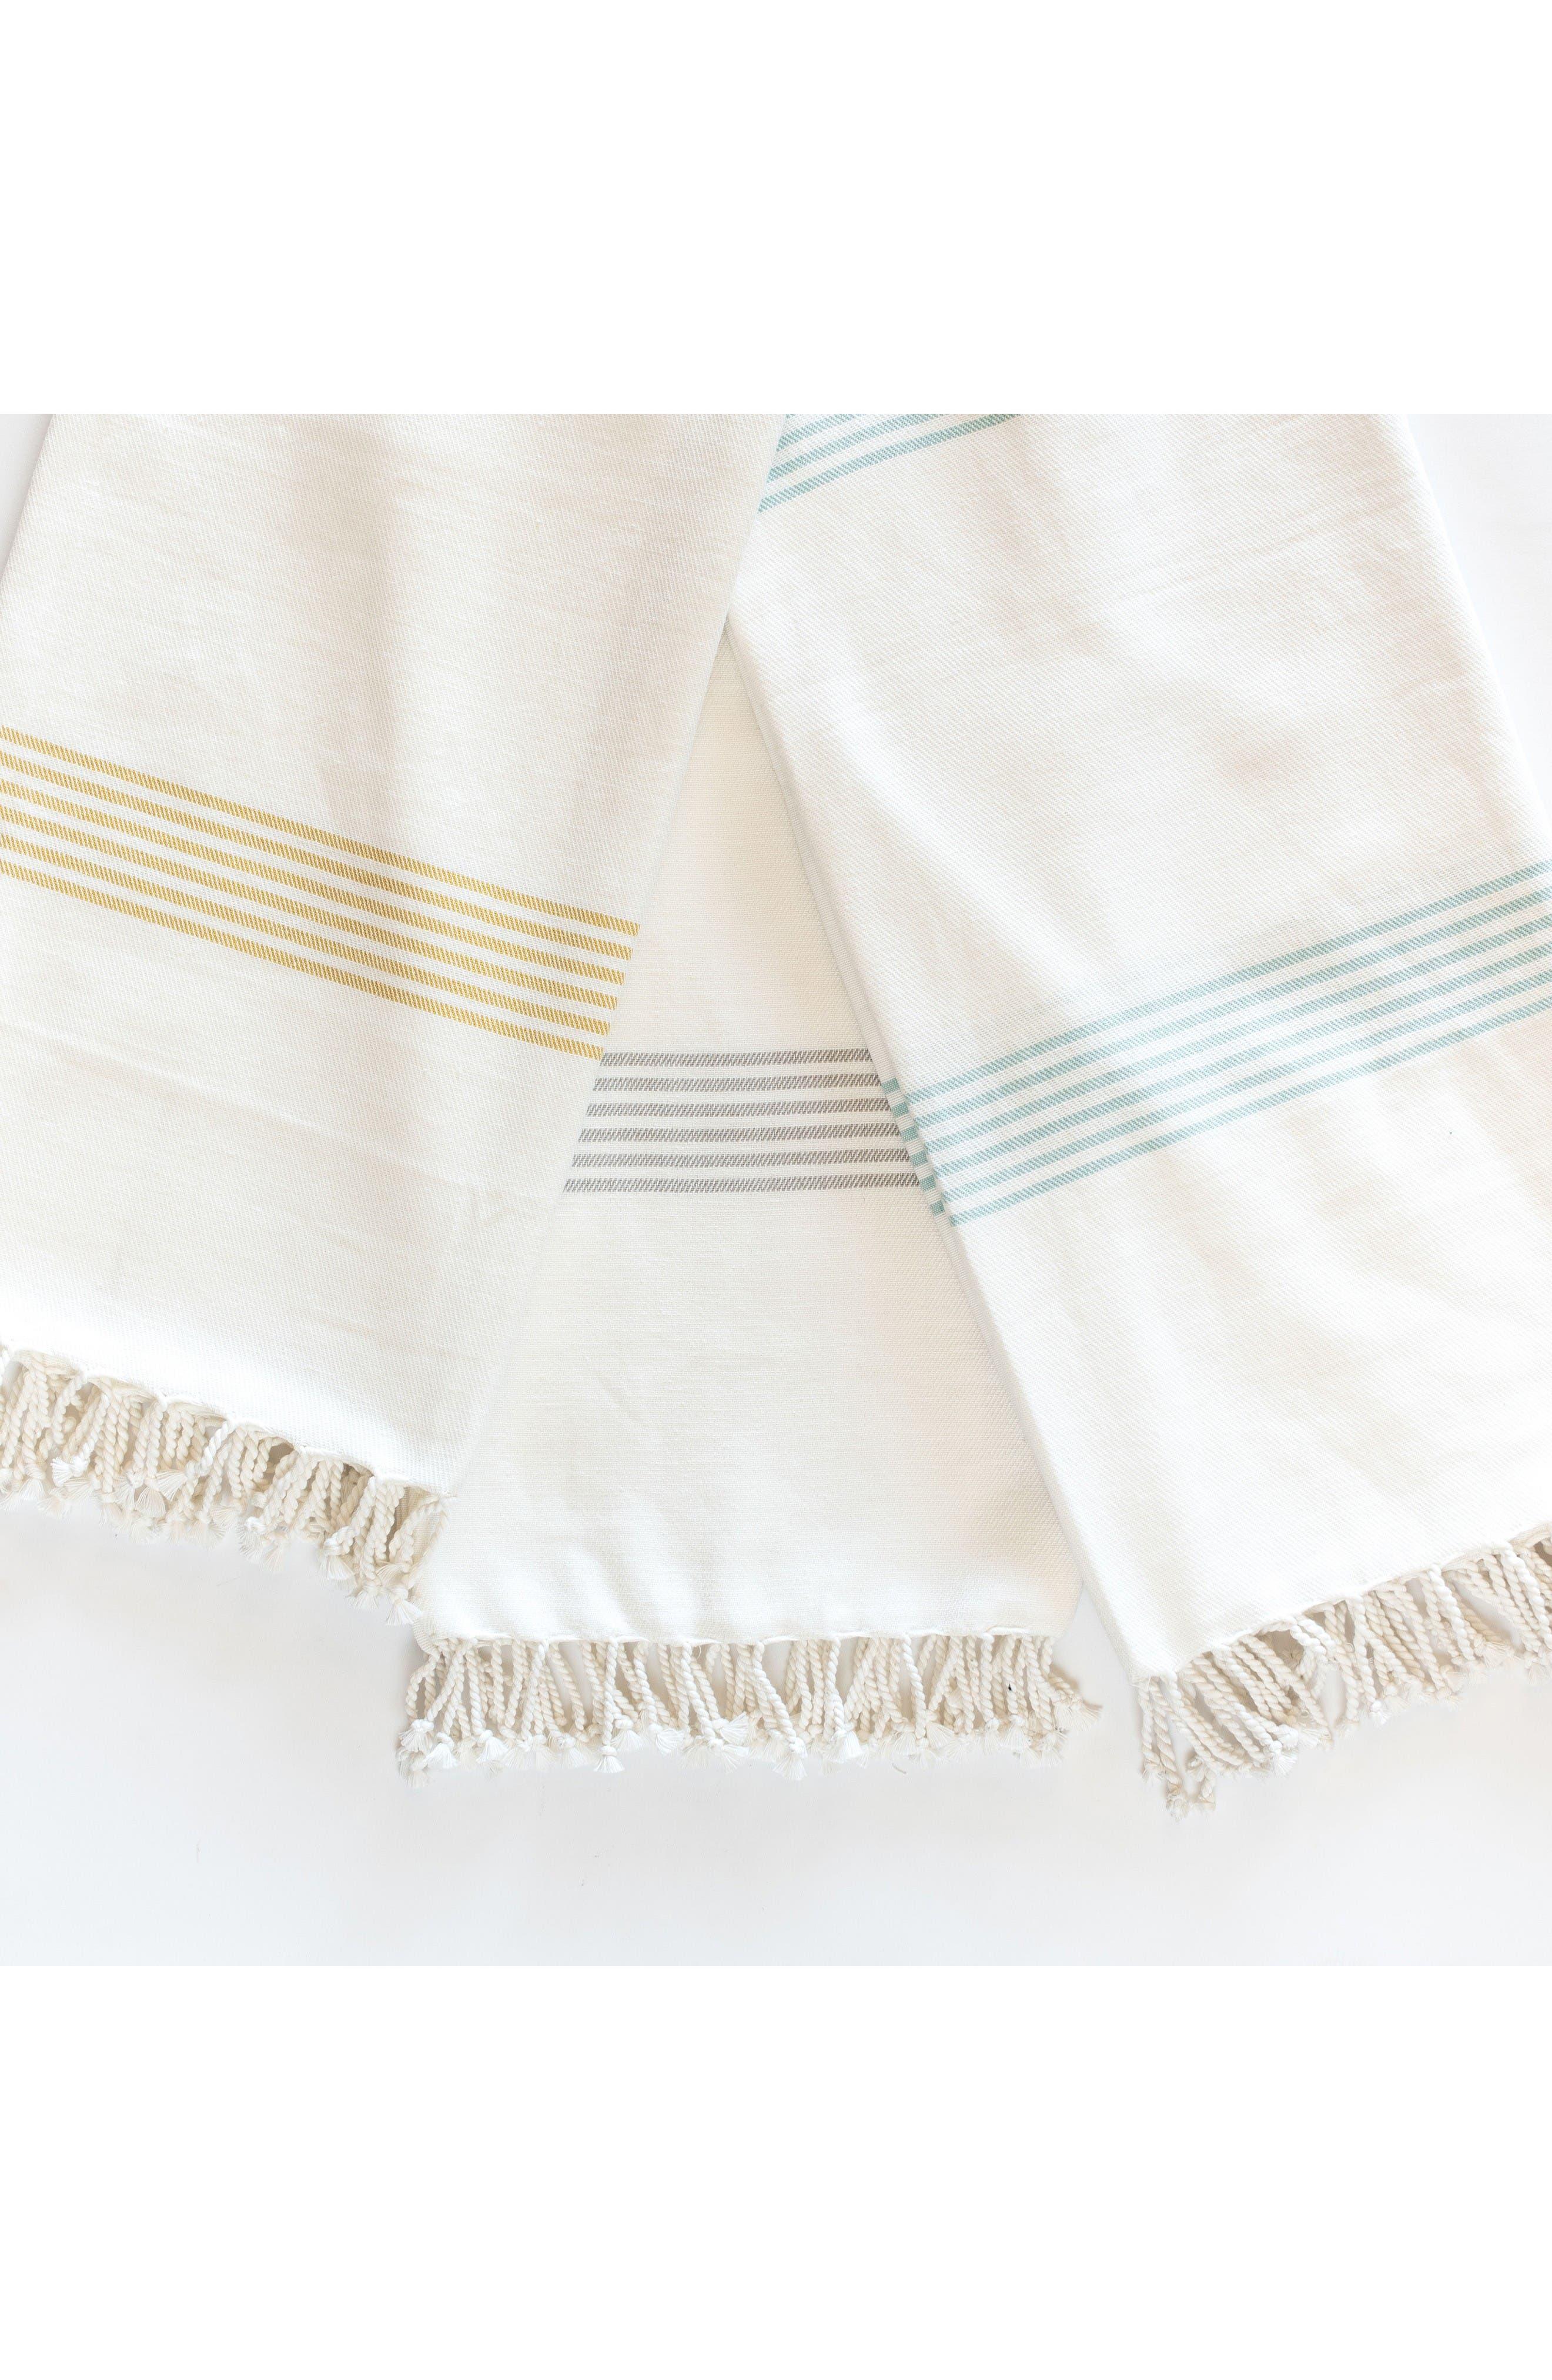 Hudson Throw Blanket,                             Alternate thumbnail 2, color,                             Aqua